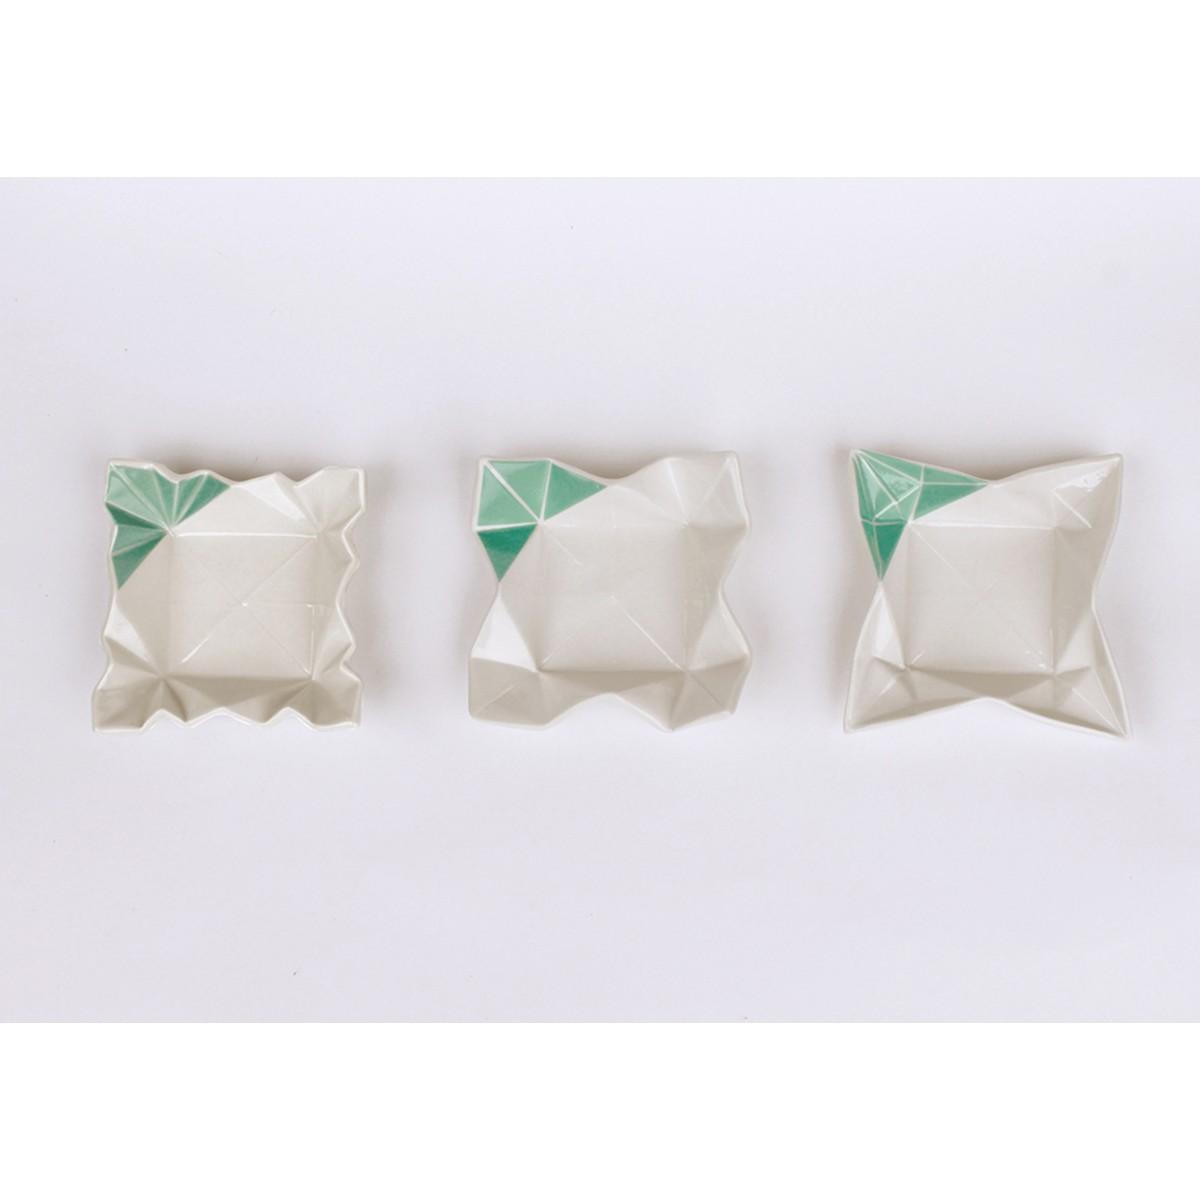 moij design Origami Dipschalen farbig